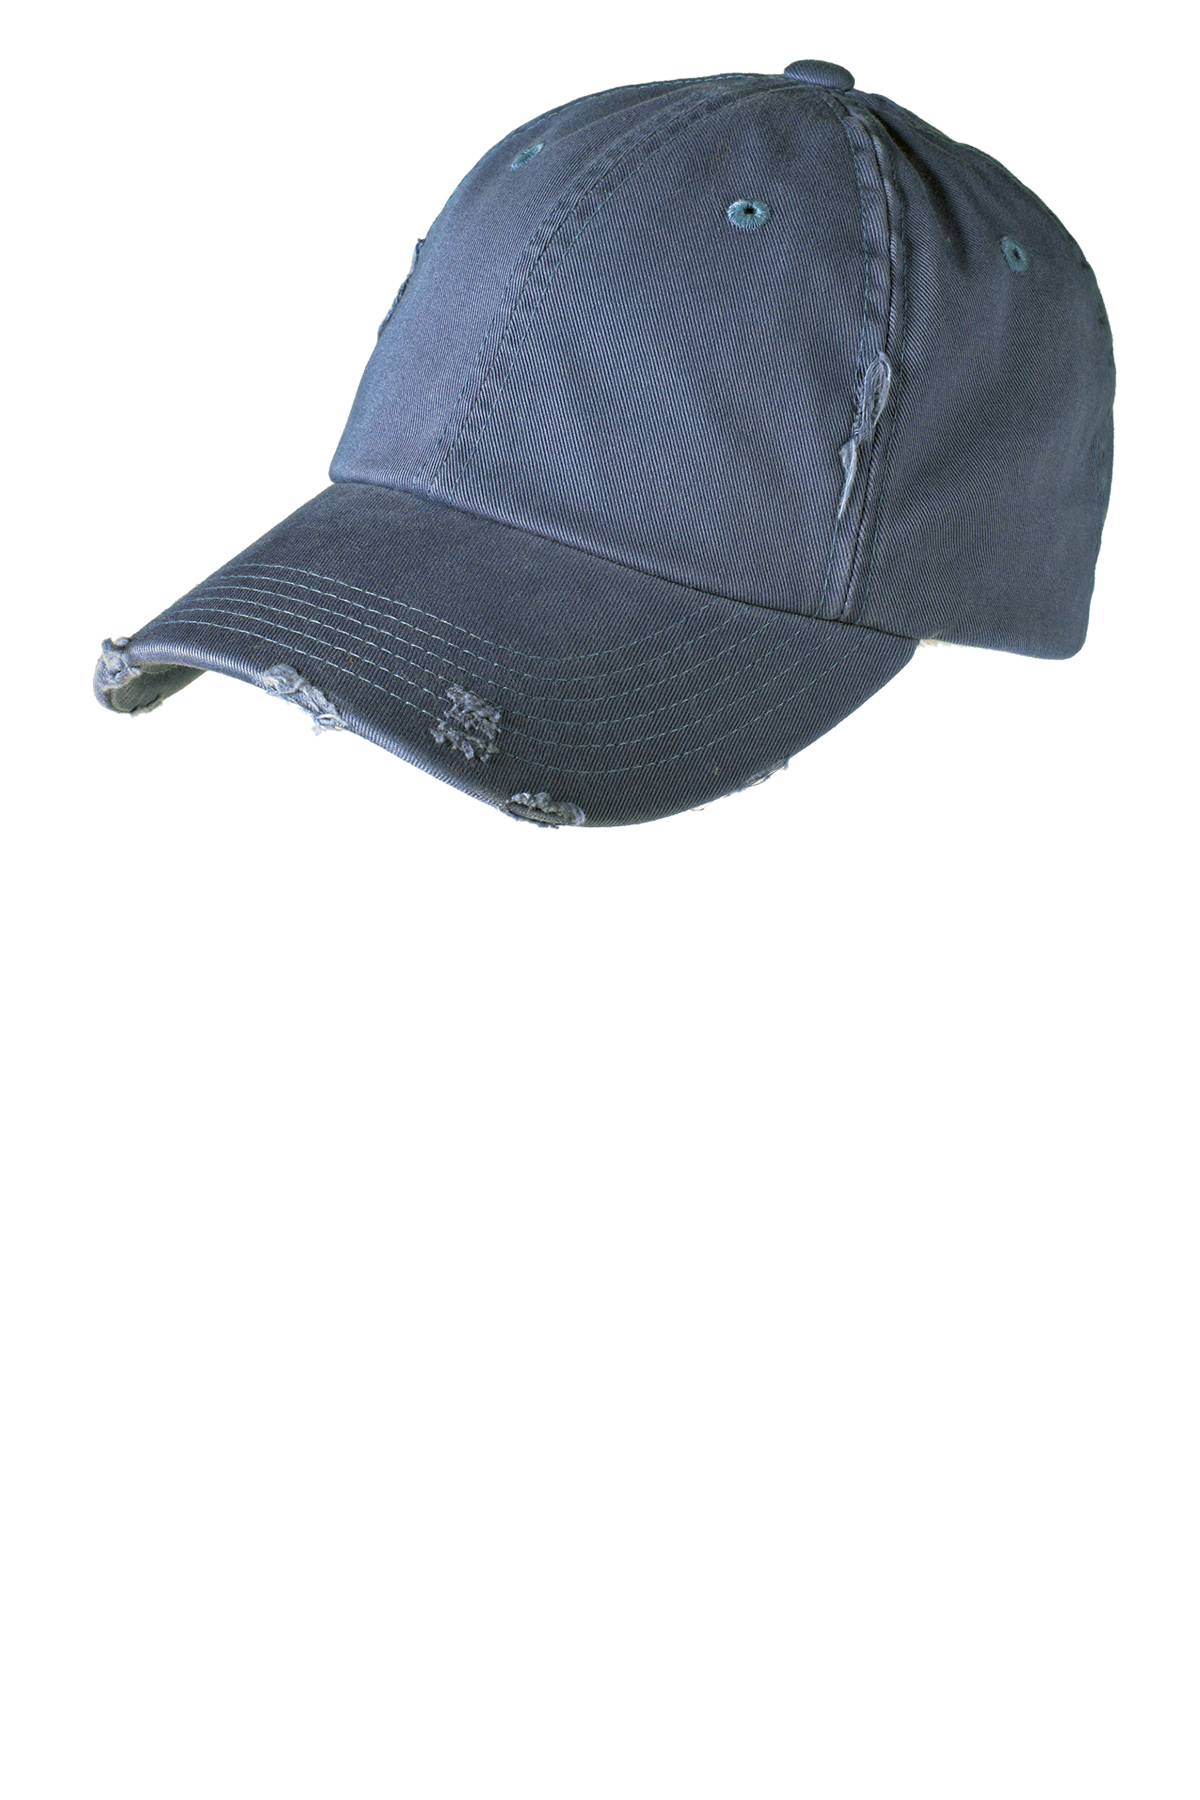 a682b75f District ® Distressed Cap | District | Brands | SanMar